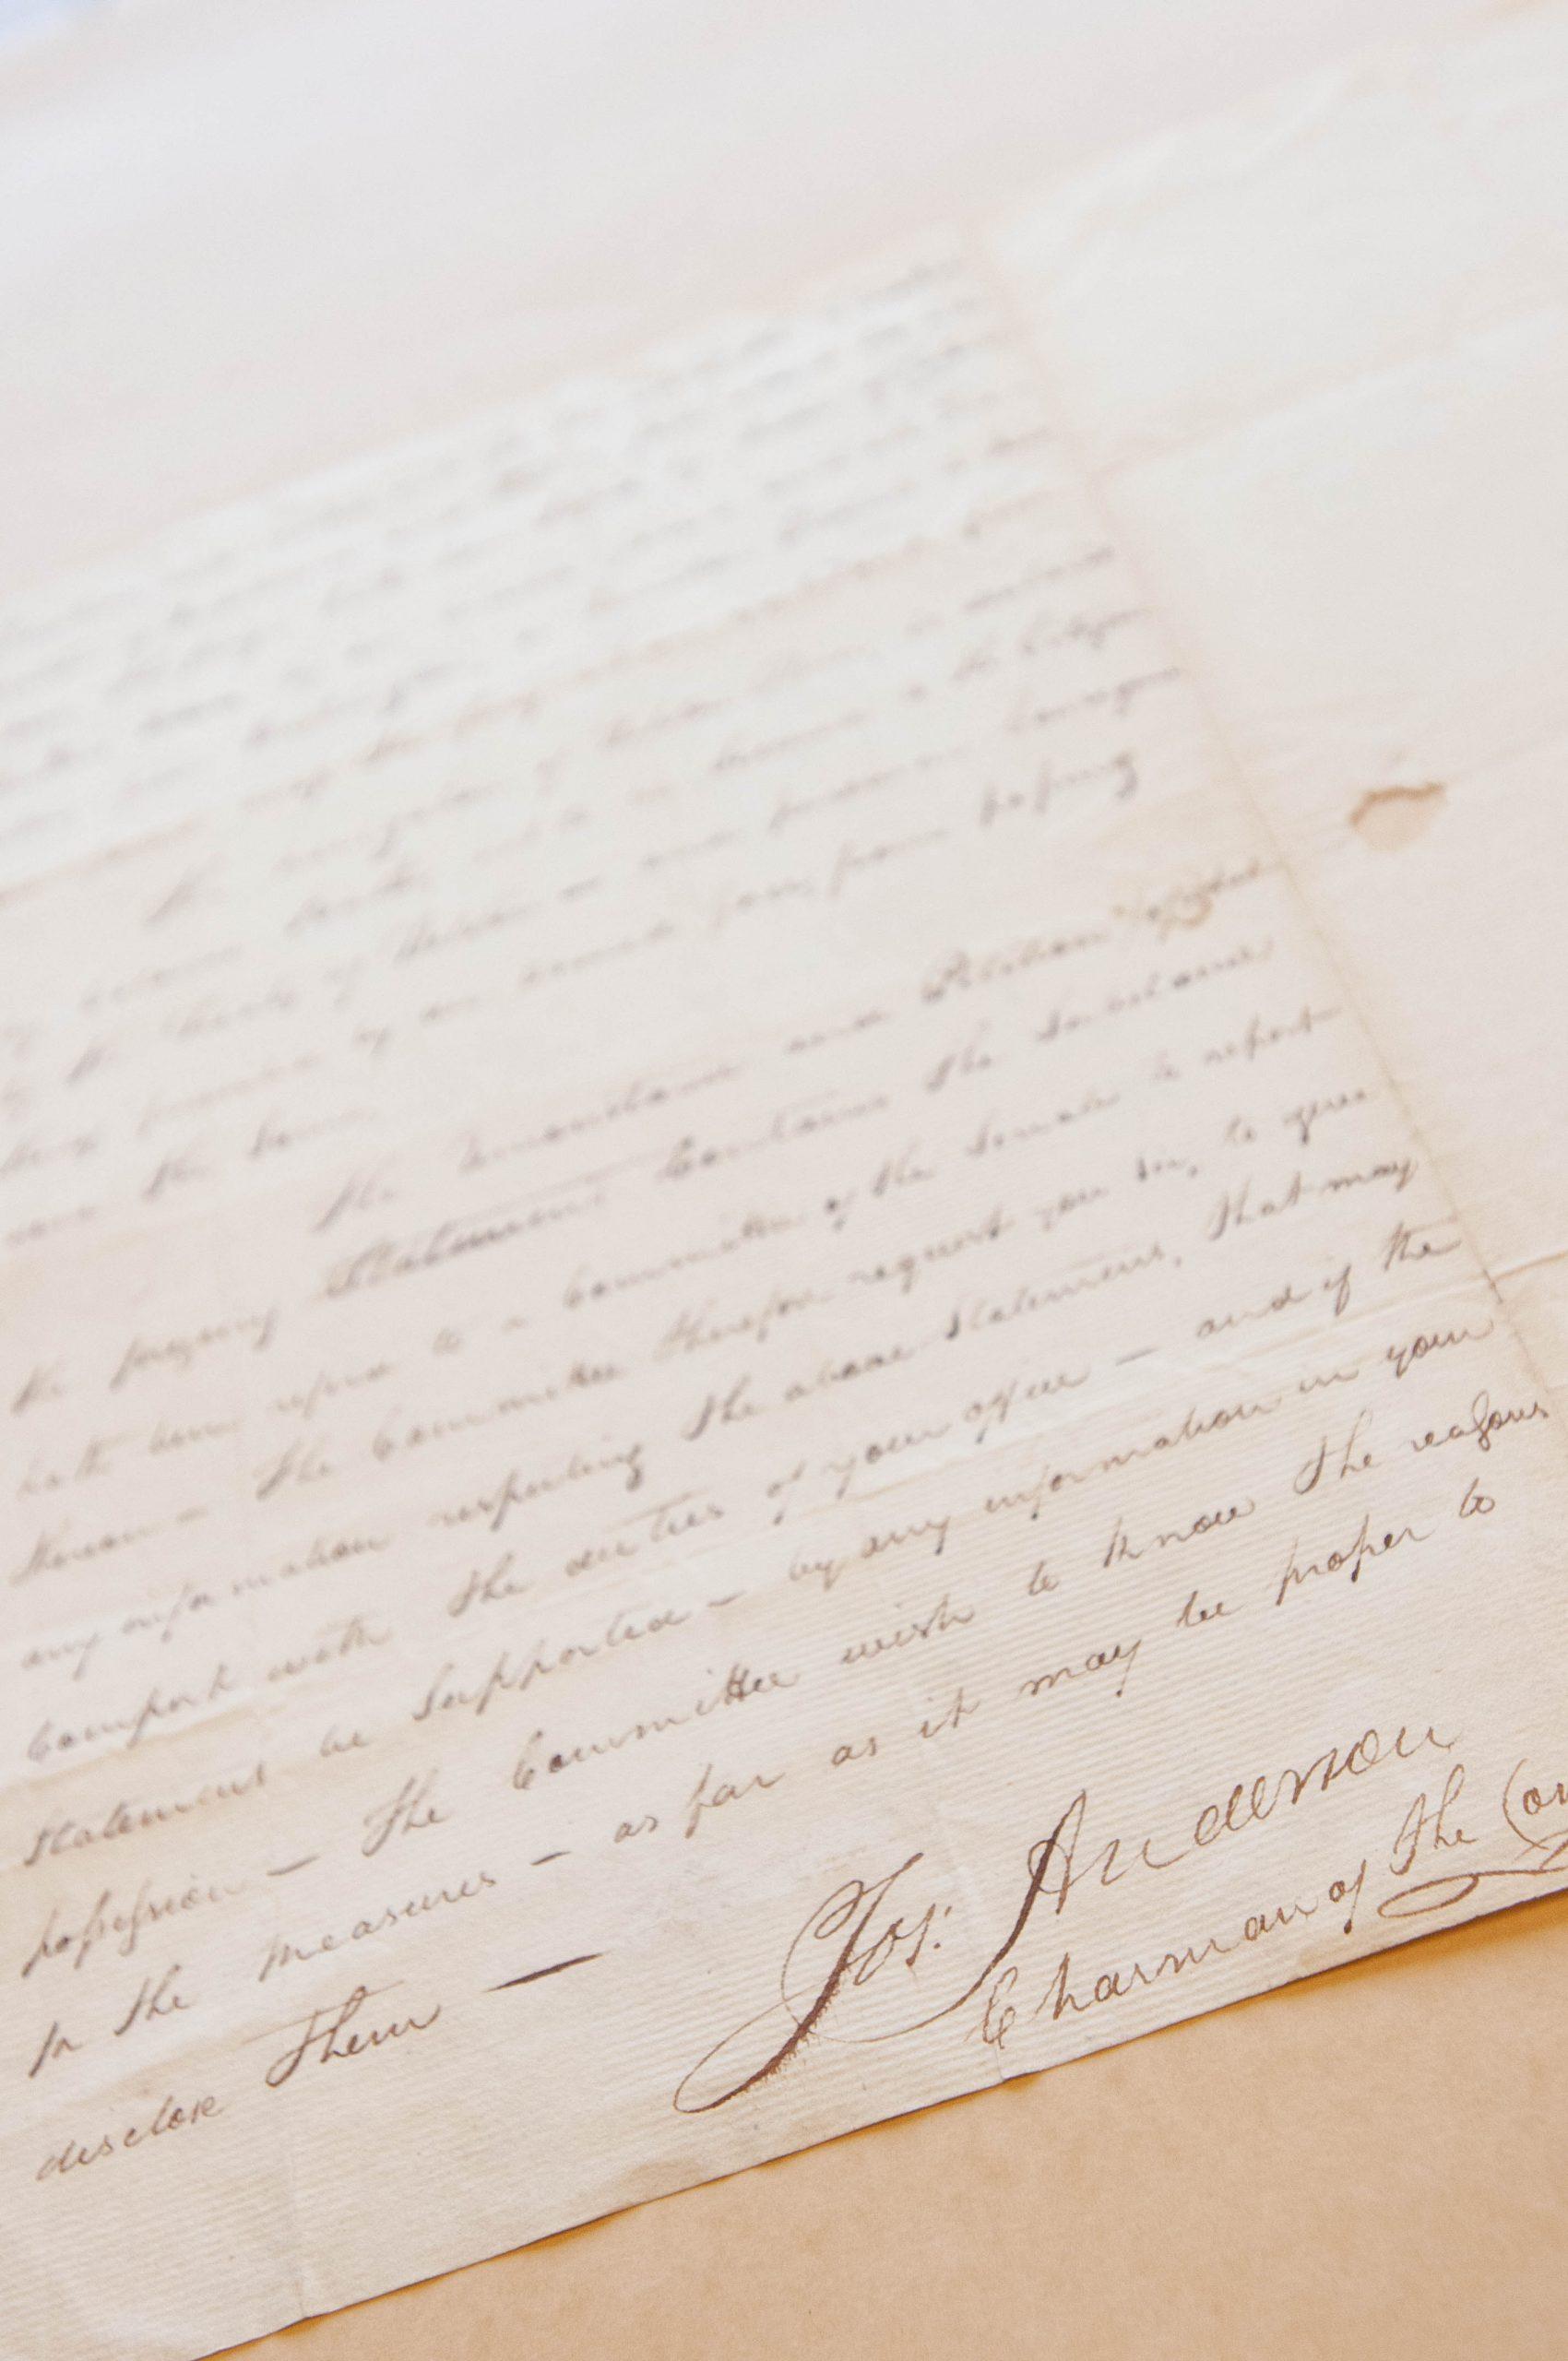 Letter from Senator Joseph Anderson to Secretary of War James McHenry